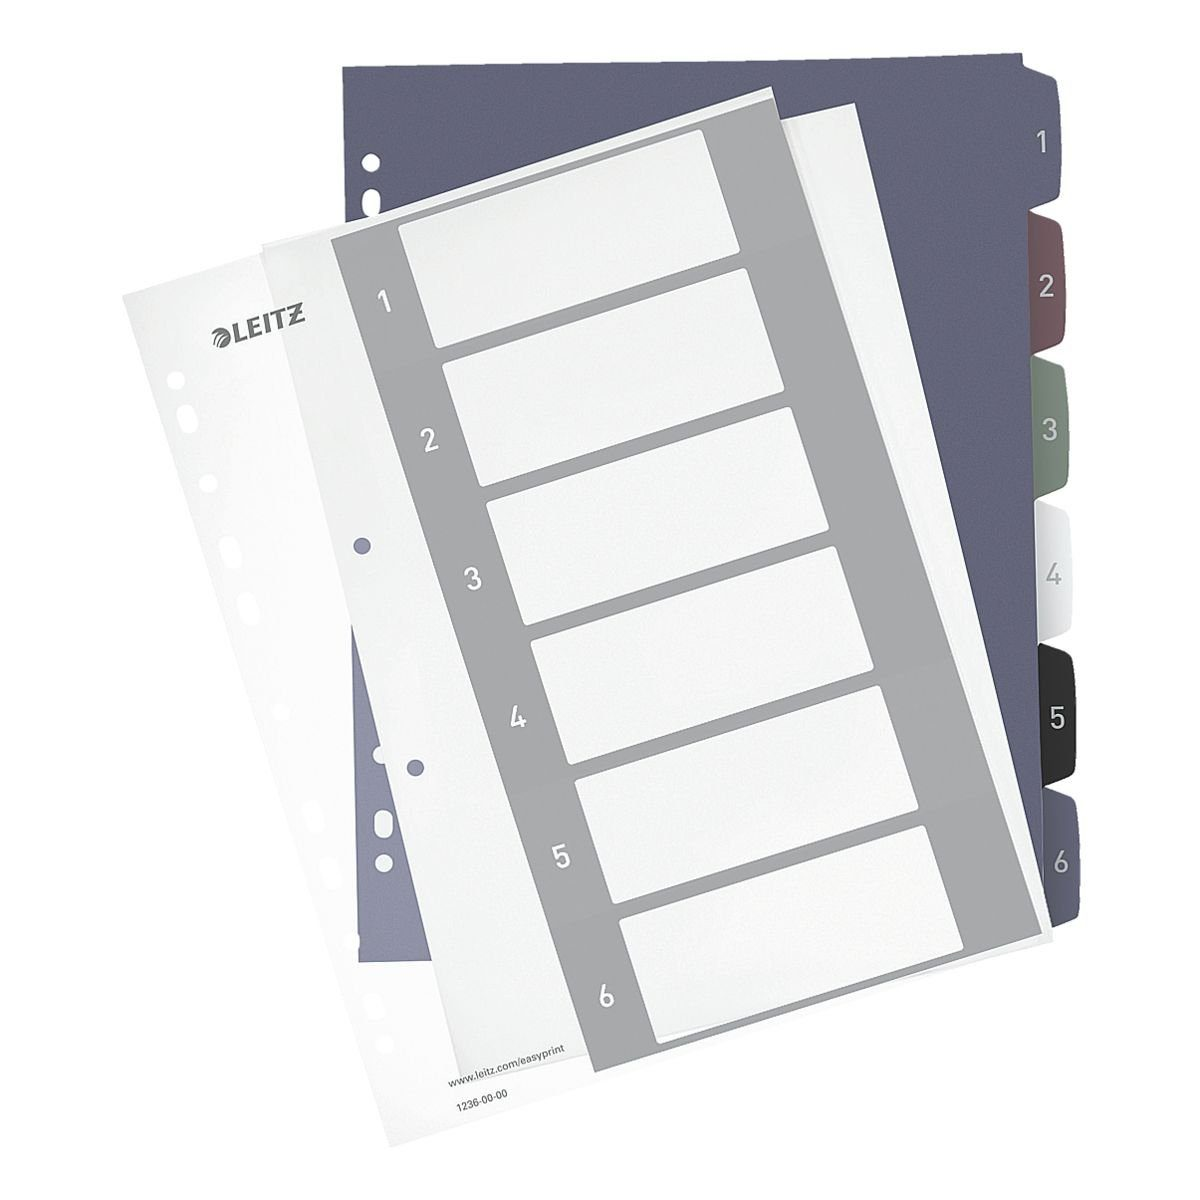 Leitz PC-beschriftbares Register , Zahlen 1-6 »Style«